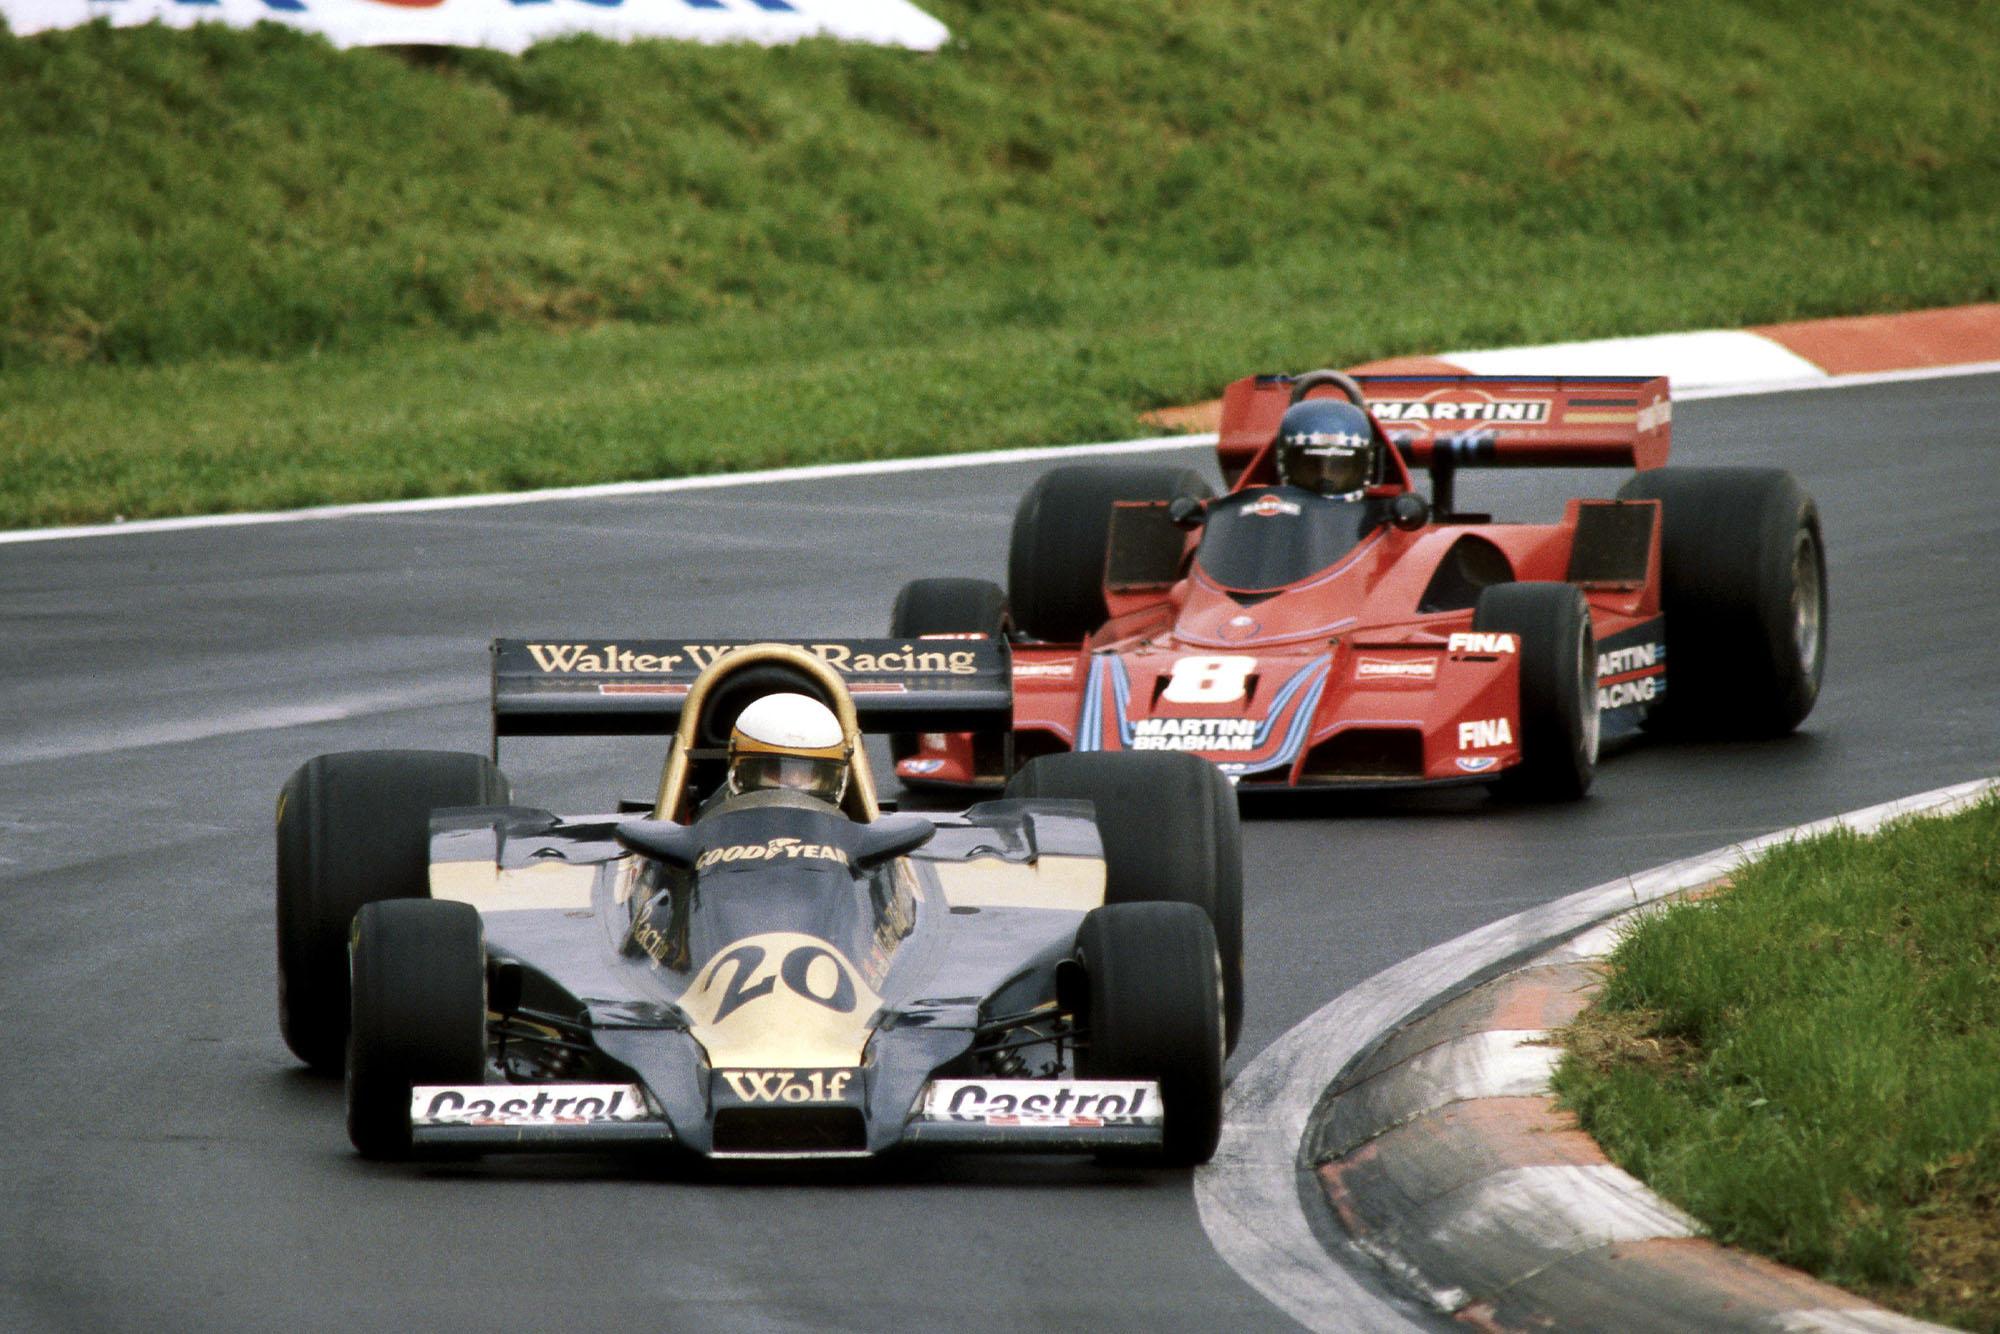 Jody Scheckter (Wolf) leads Hans-Joachim Stuck's Brabham at the 1977 Austrian Grand Prix, Österreichring.